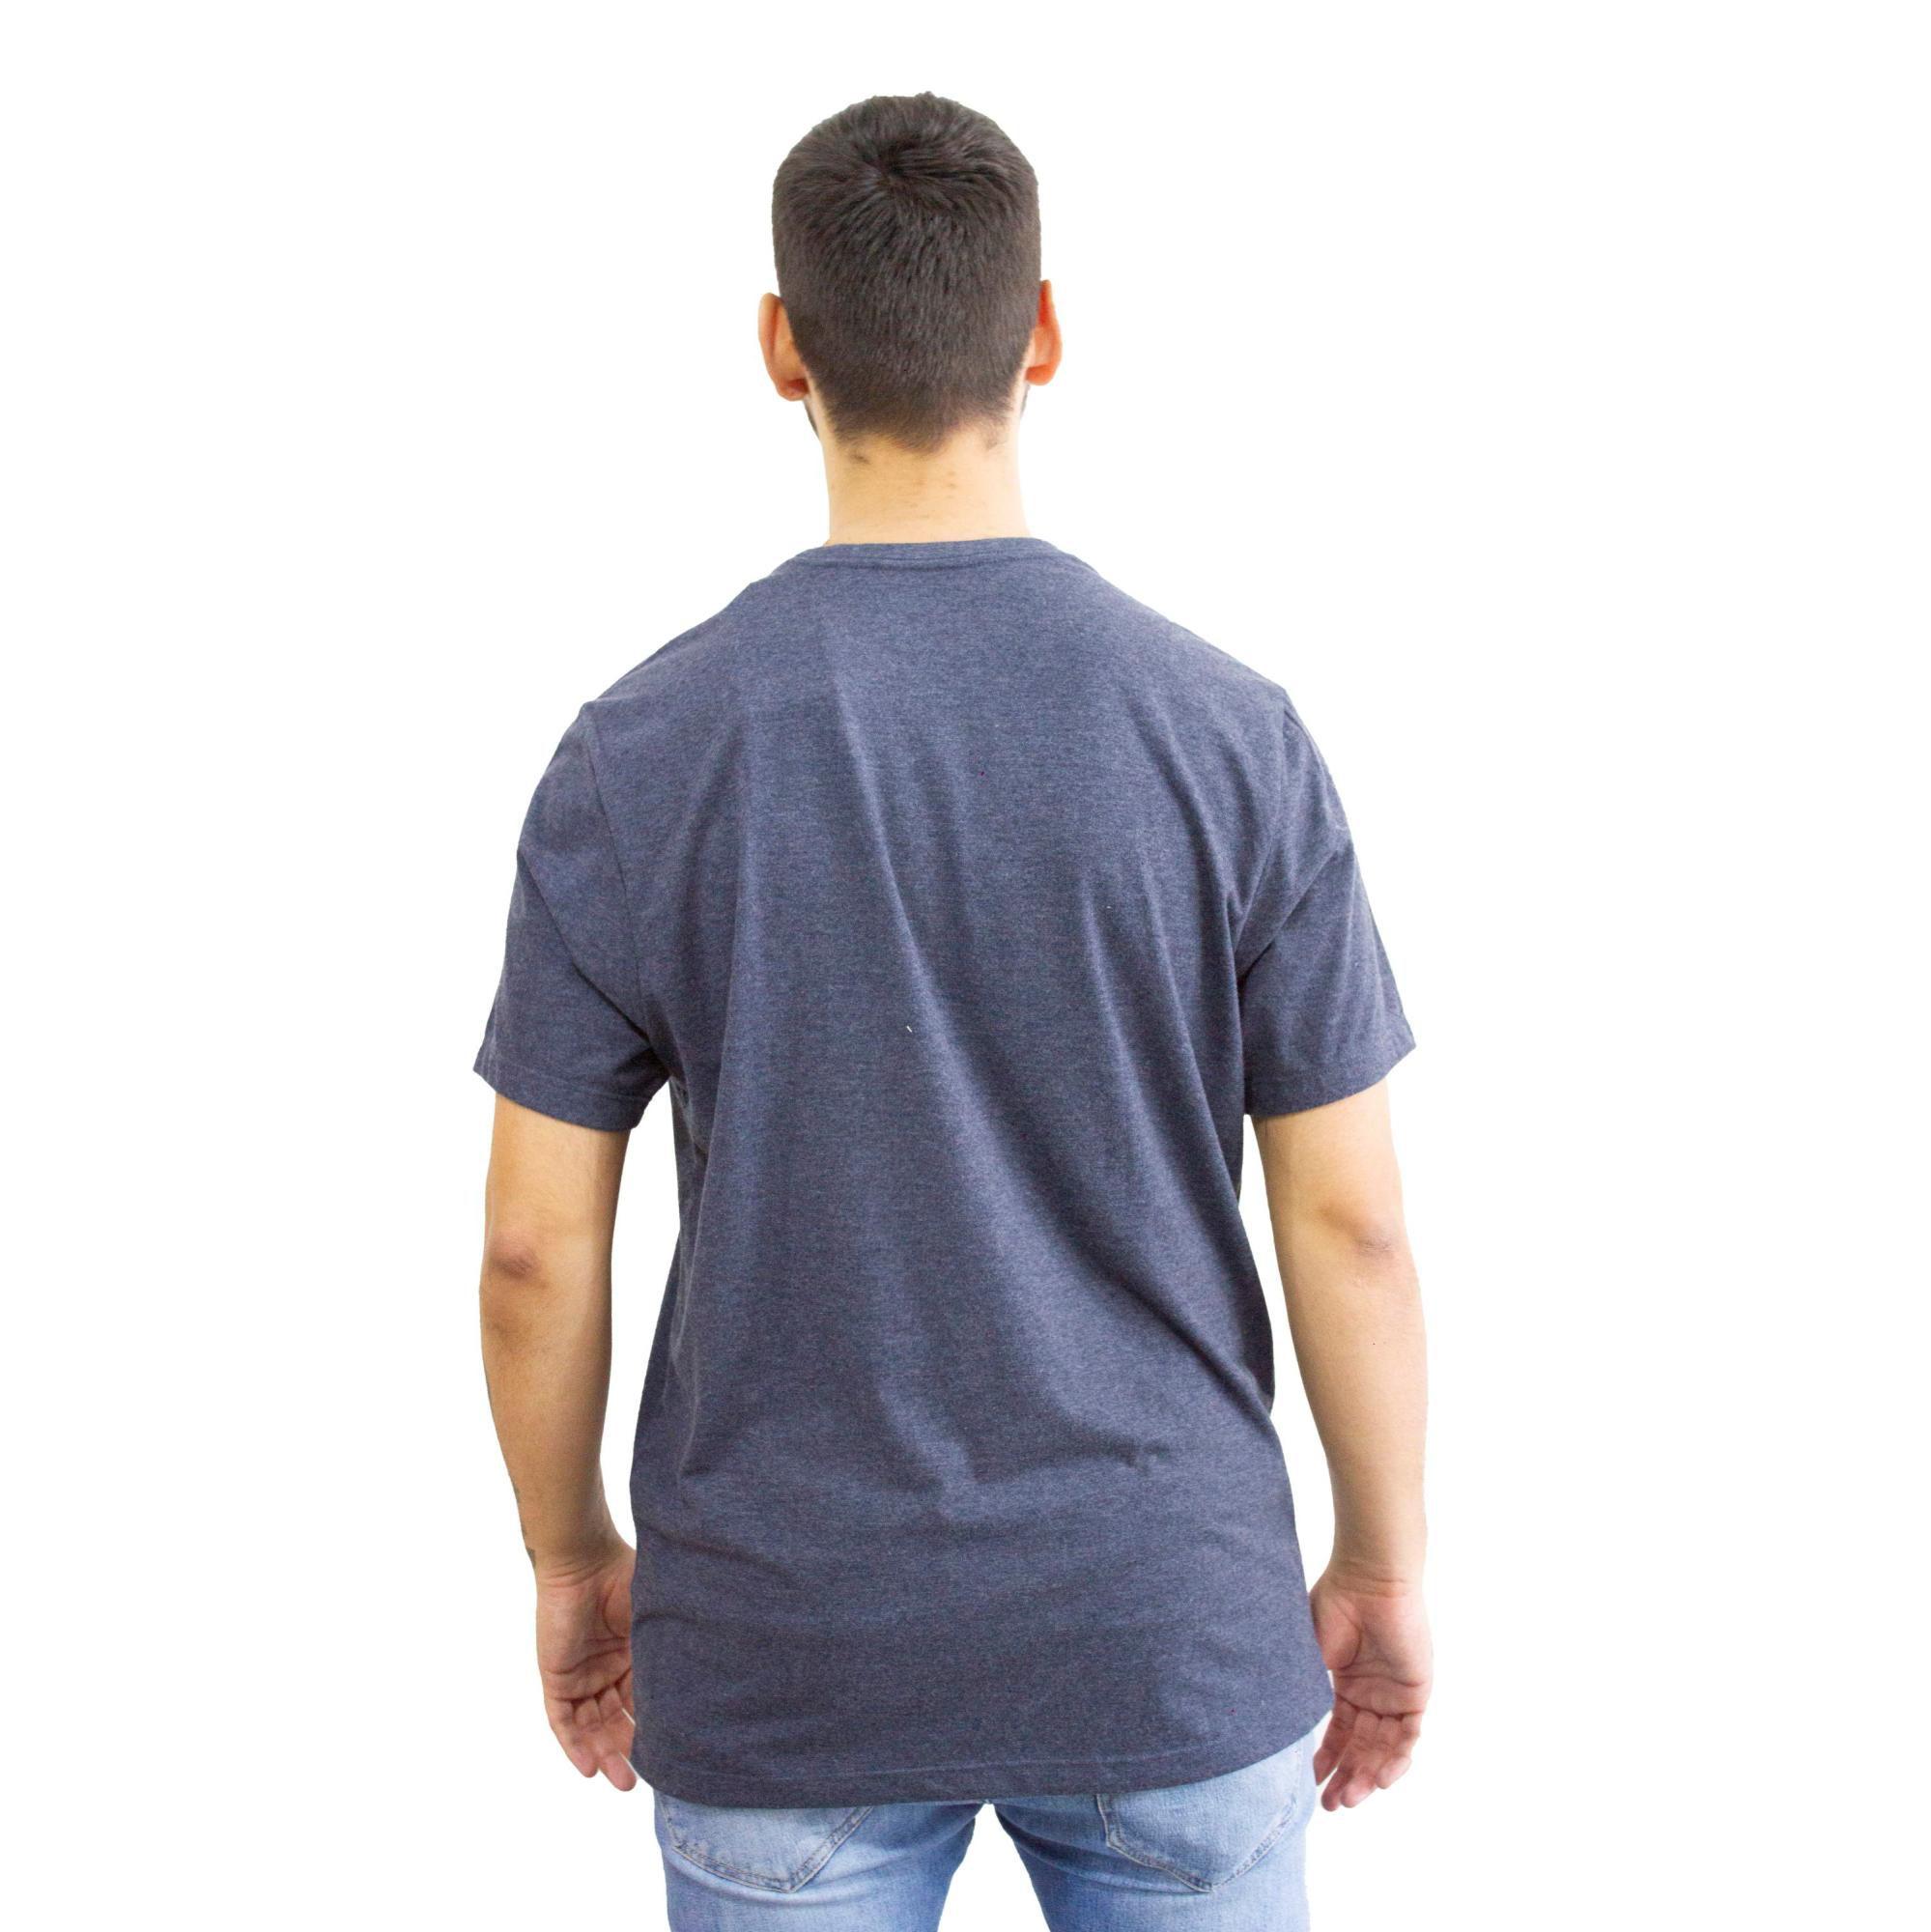 Camiseta Aéropostale California Mescla Azul